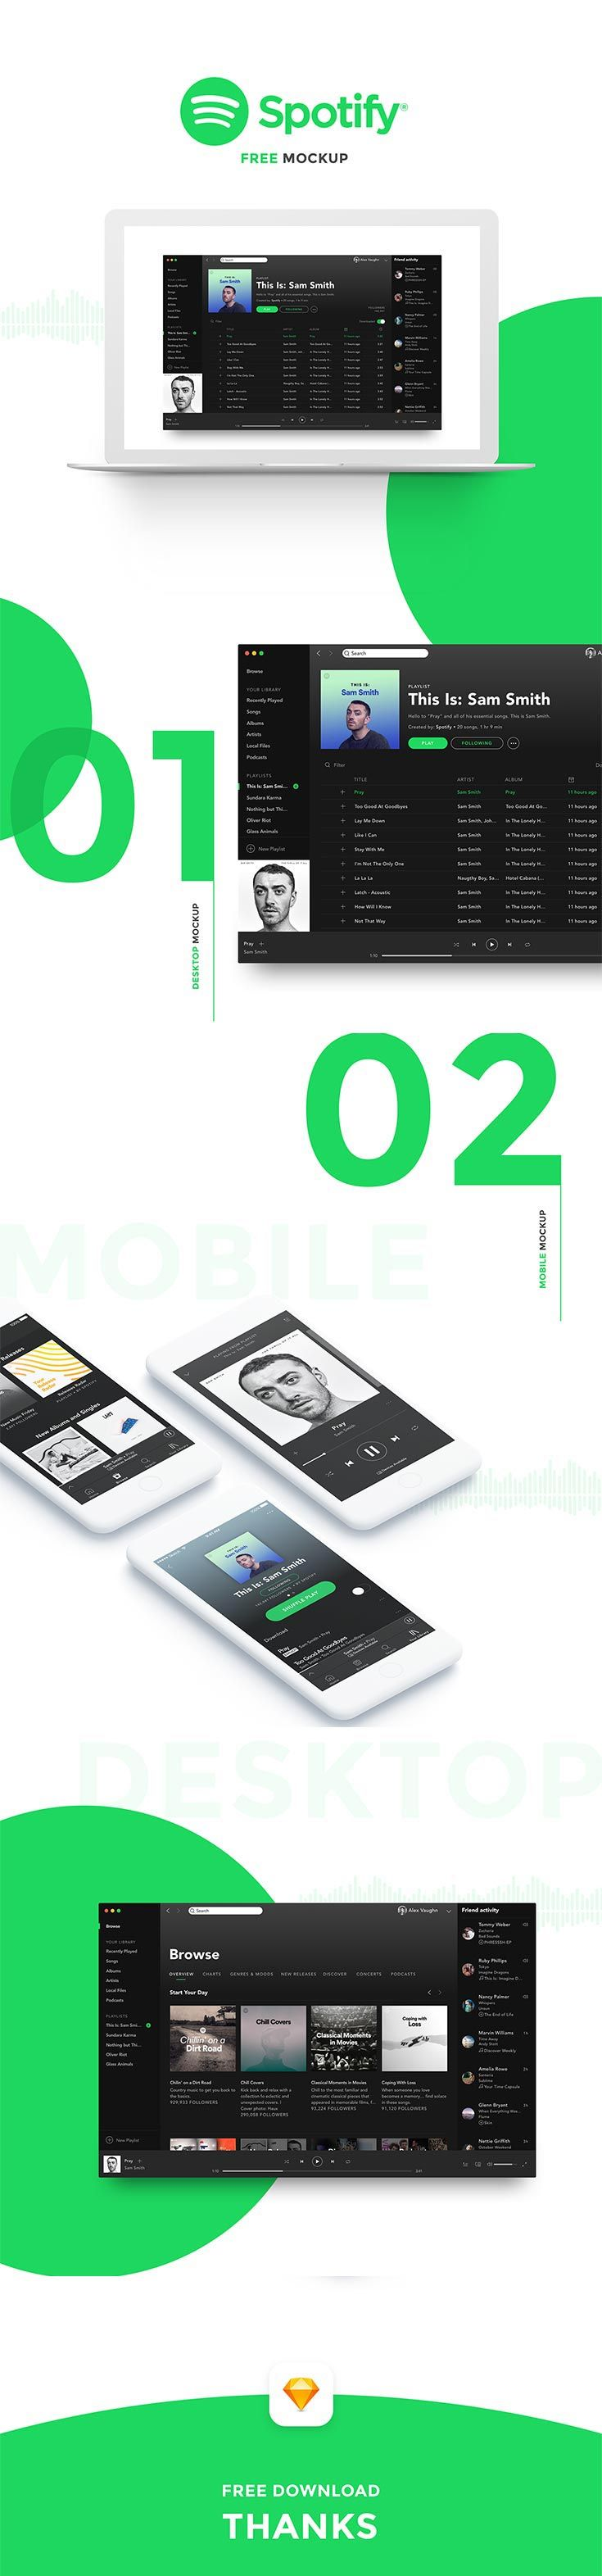 Free Spotify Mockup Mockup Spotify Spotify Mobile